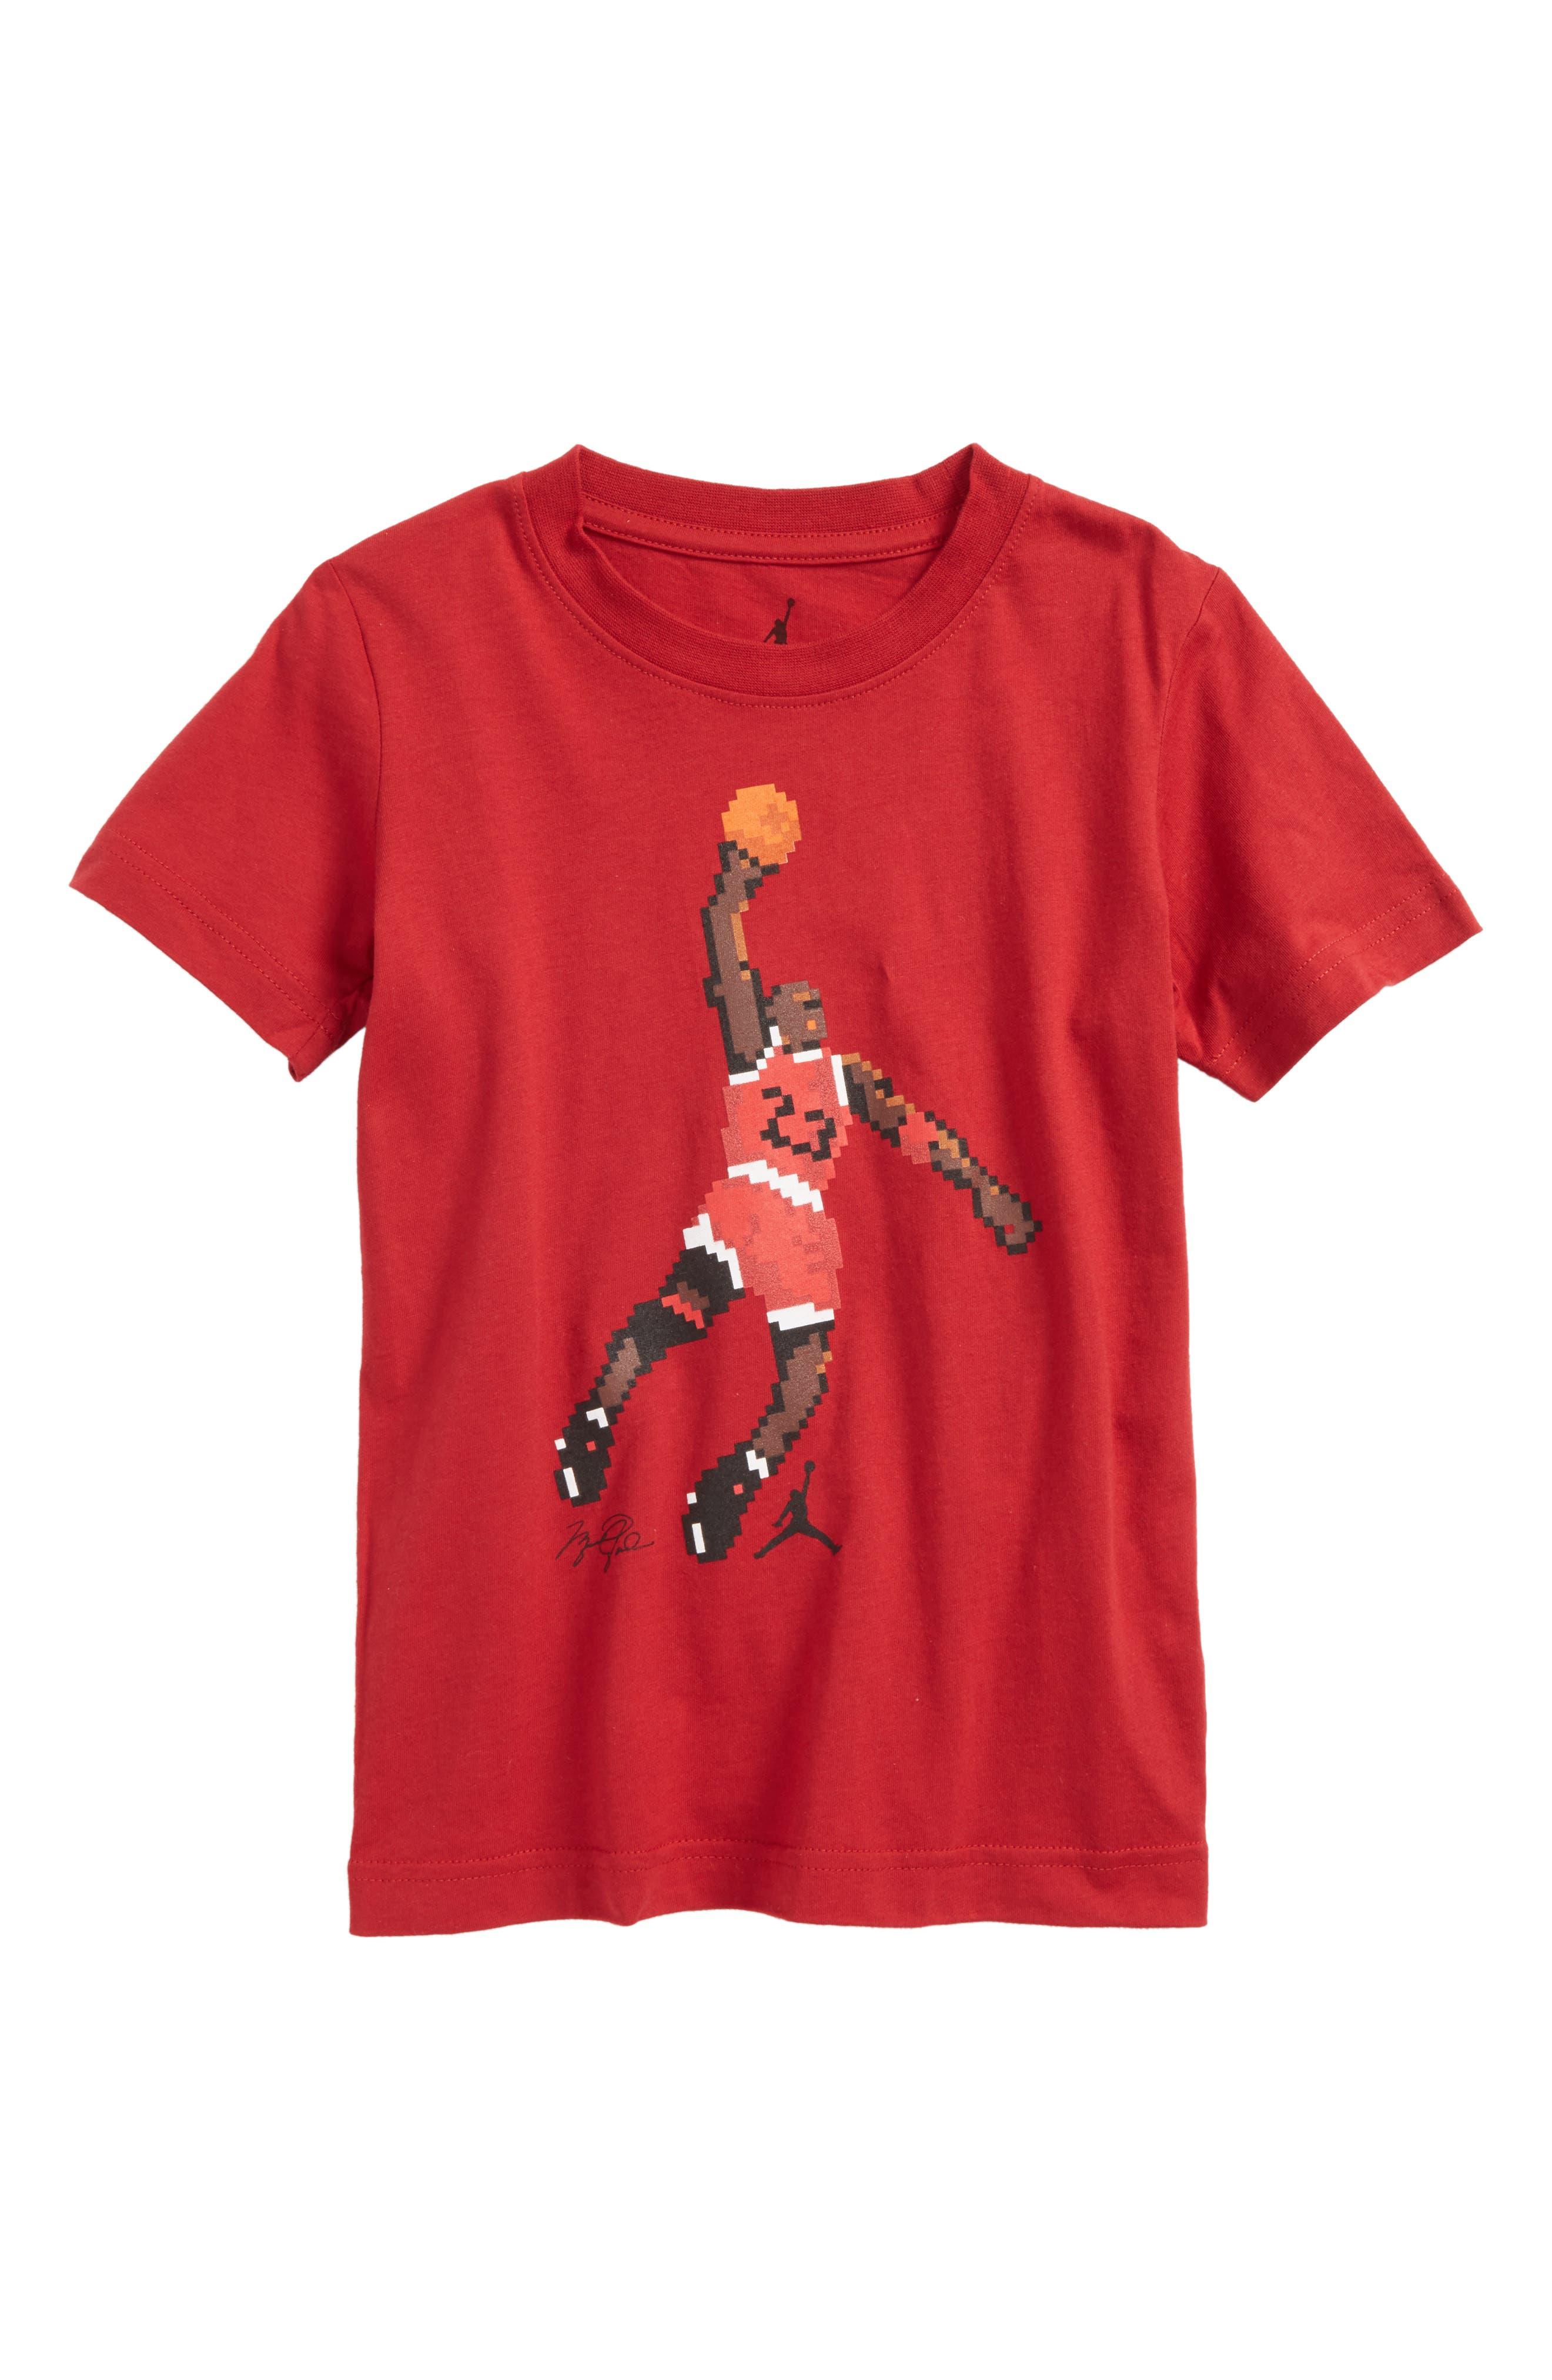 Jordan Pixel Pack AJ Dunk T-Shirt,                             Main thumbnail 1, color,